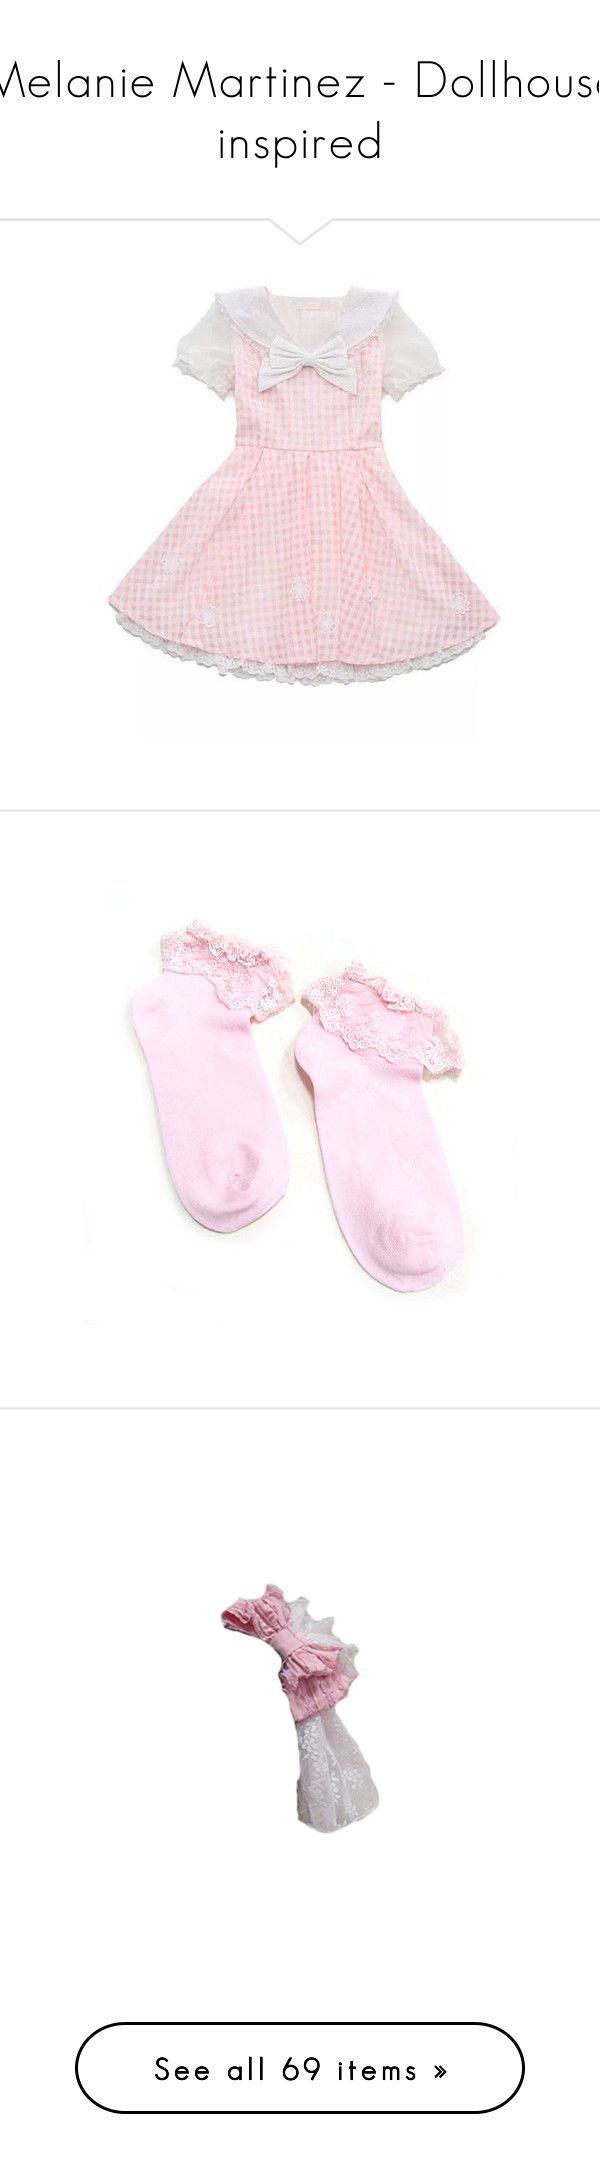 """Melanie Martinez - Dollhouse inspired"" by co8alt-corsair ❤ liked on Polyvore featuring dresses, pink, intimates, hosiery, socks, socks and tights, legwear, ruffle socks, dot socks and lacy socks"